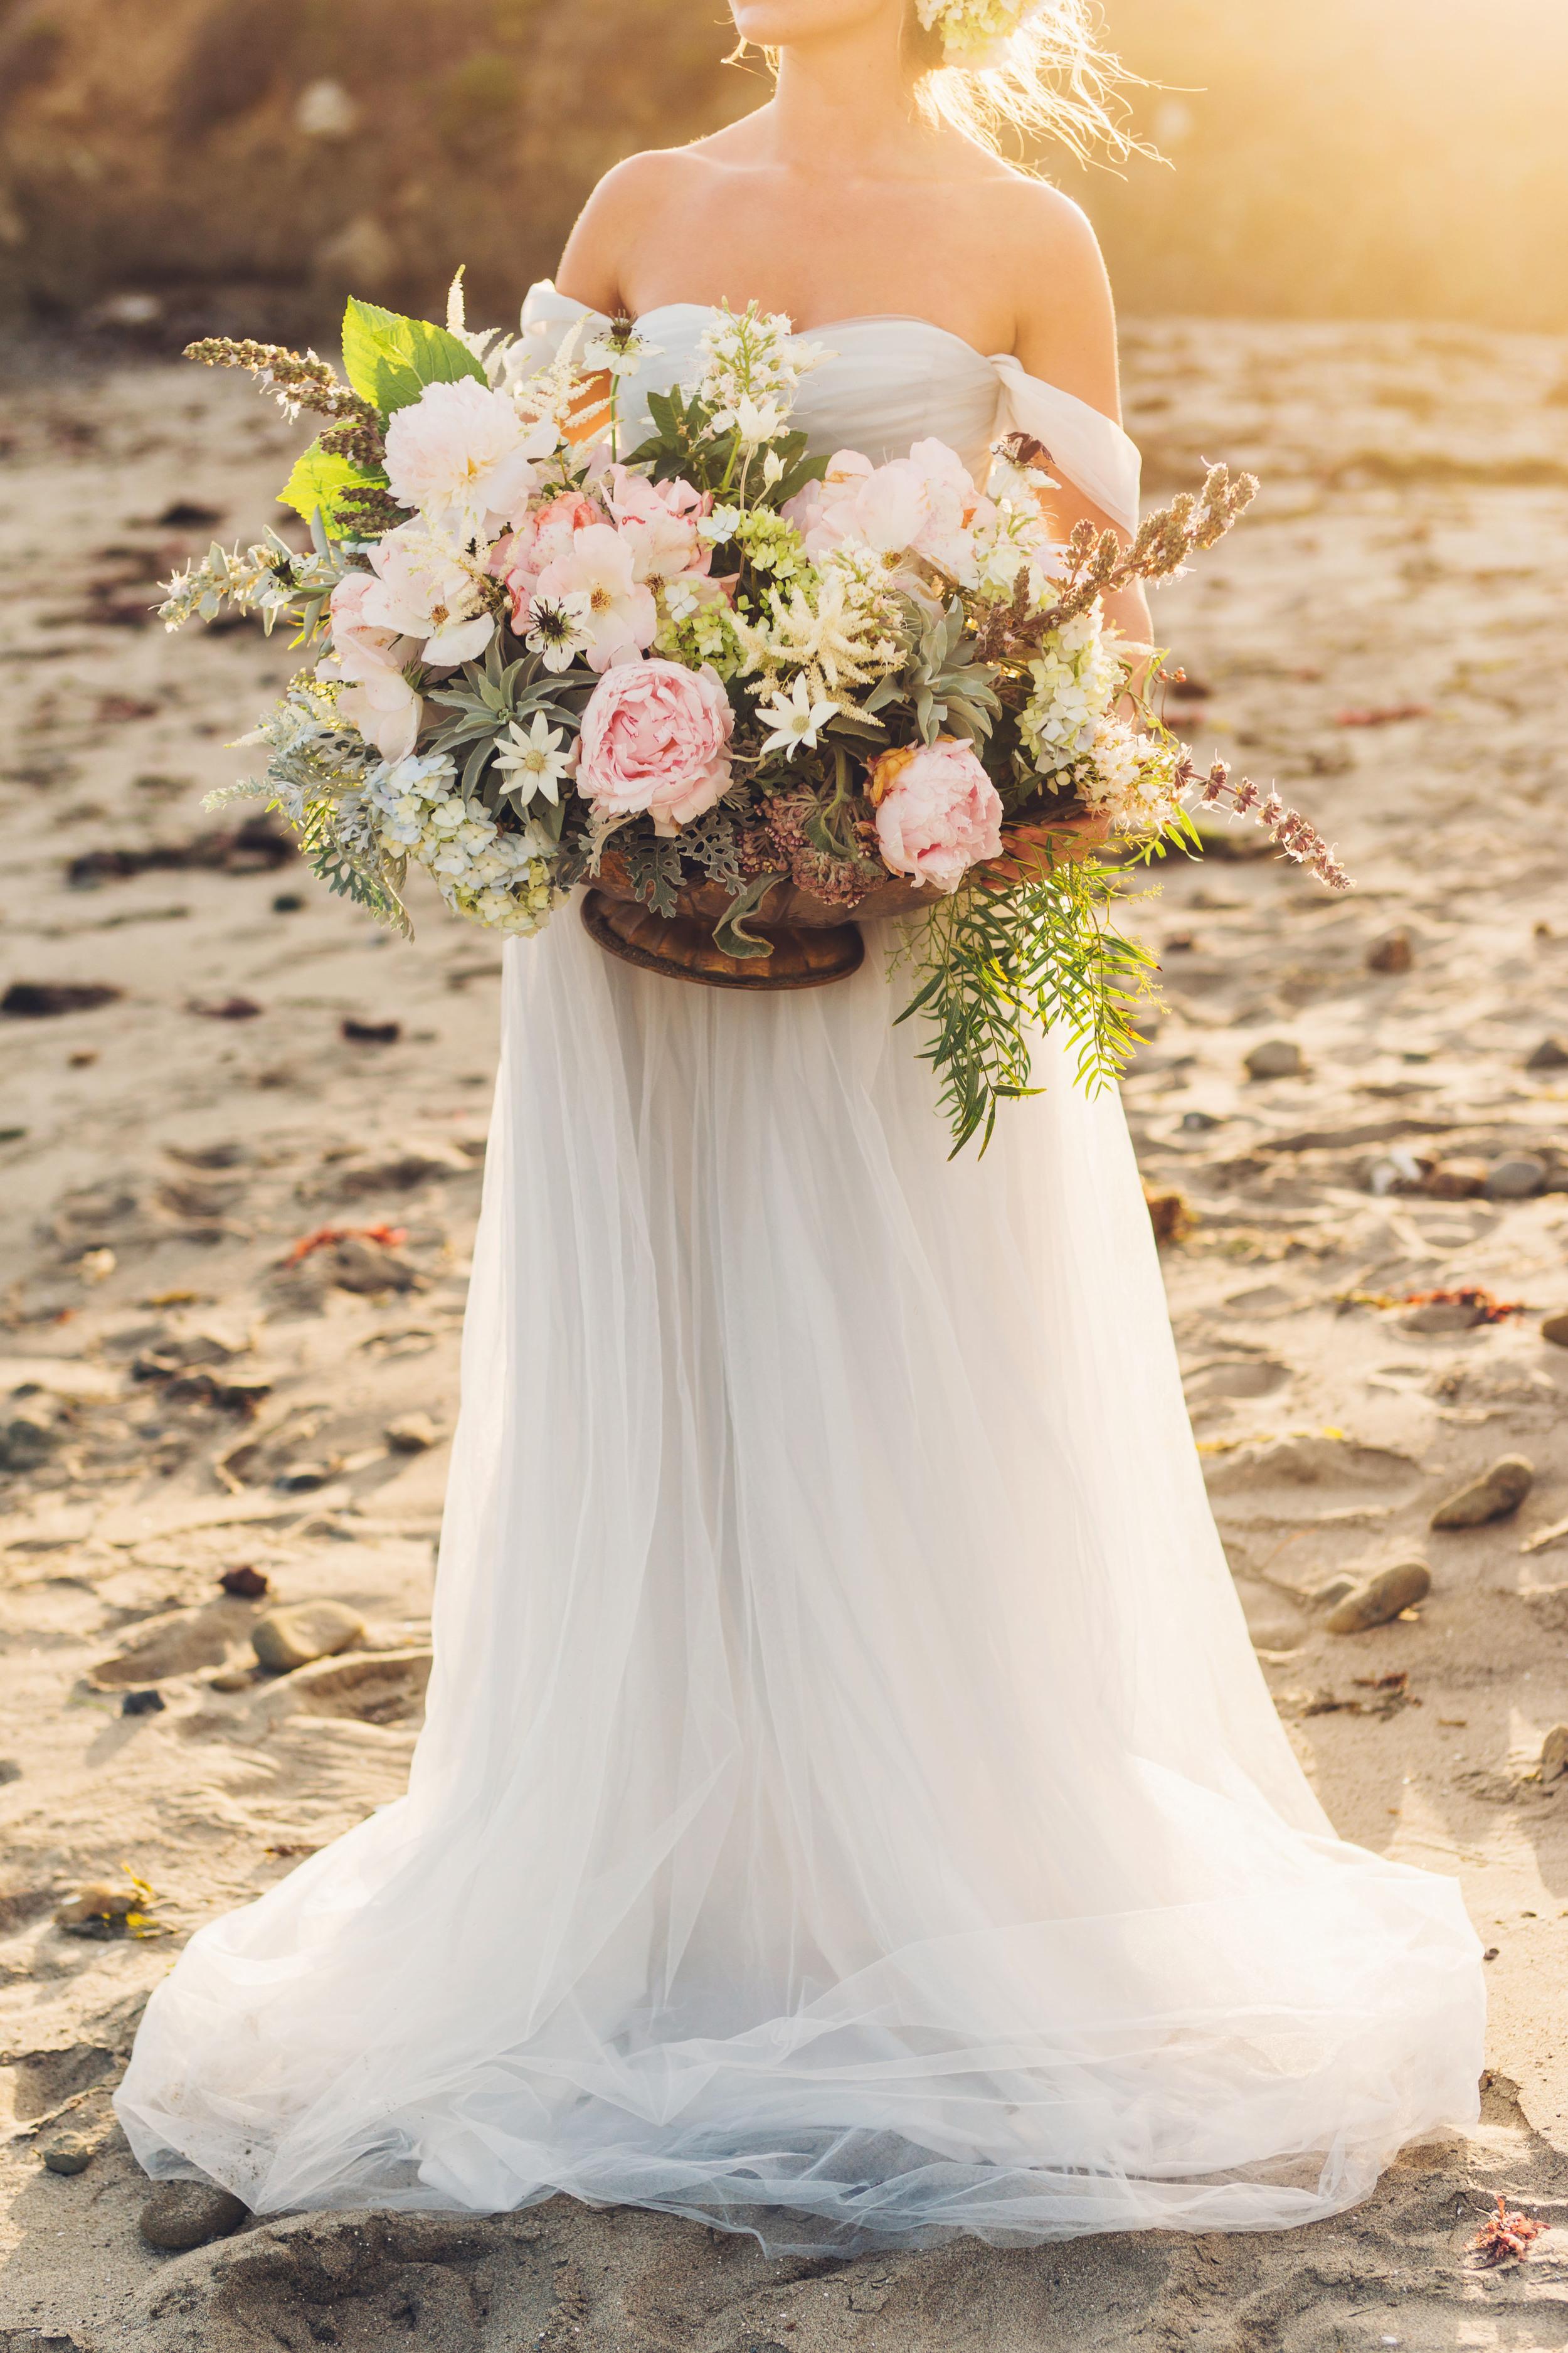 Floral arrangement with Peonies, Hydrangeas, and Jasmine